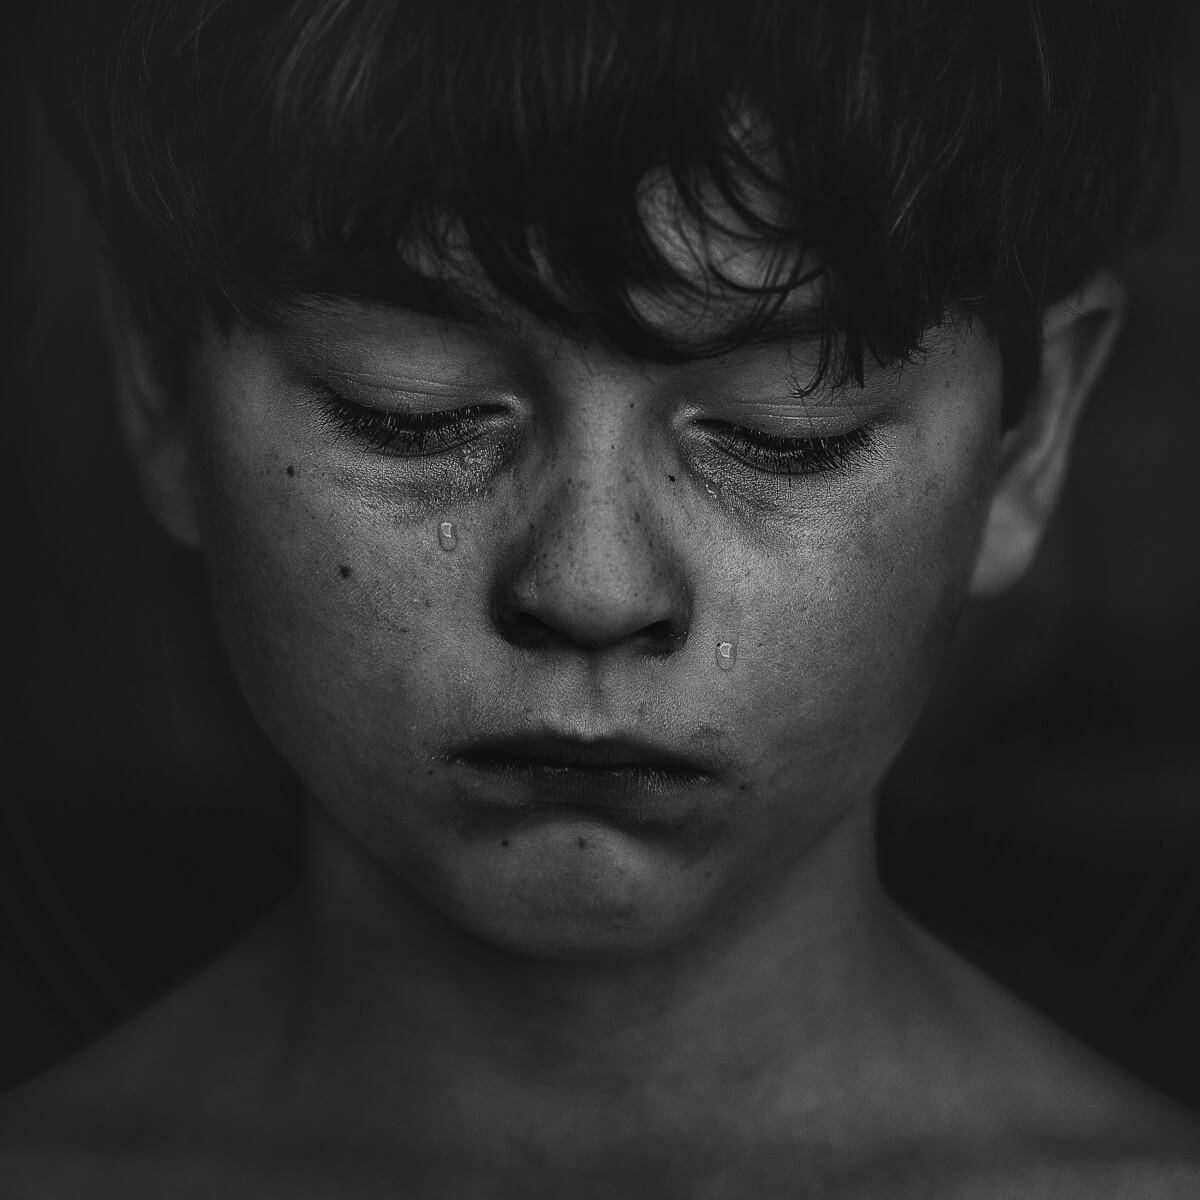 childhood trauma - Camino Recovery